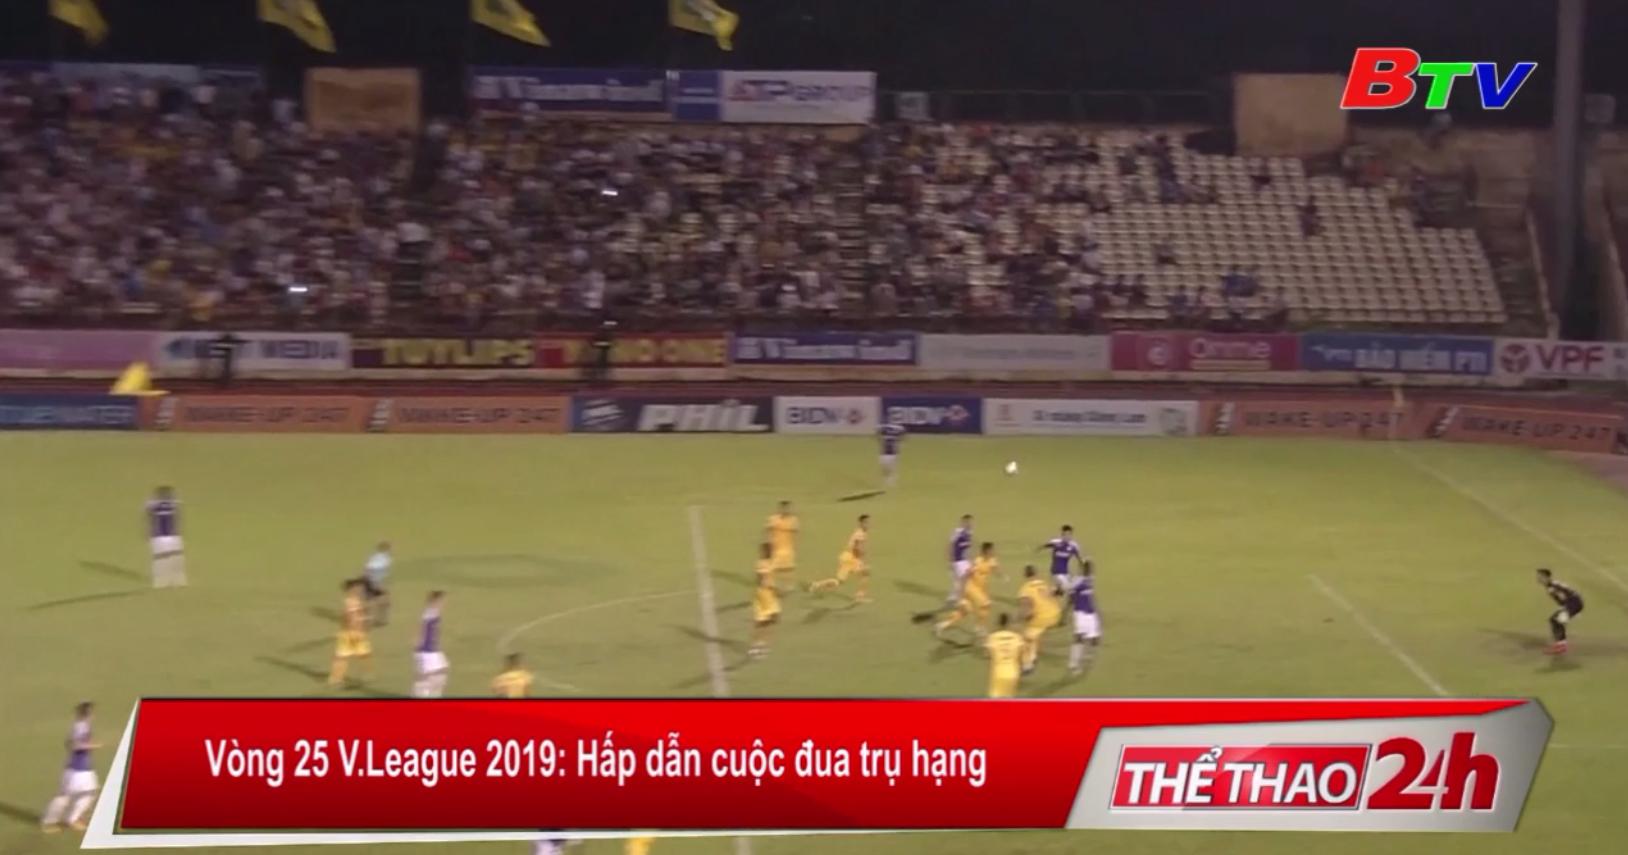 Vòng 25 V-League 2019 – Hấp dẫn cuộc đua trụ hạng